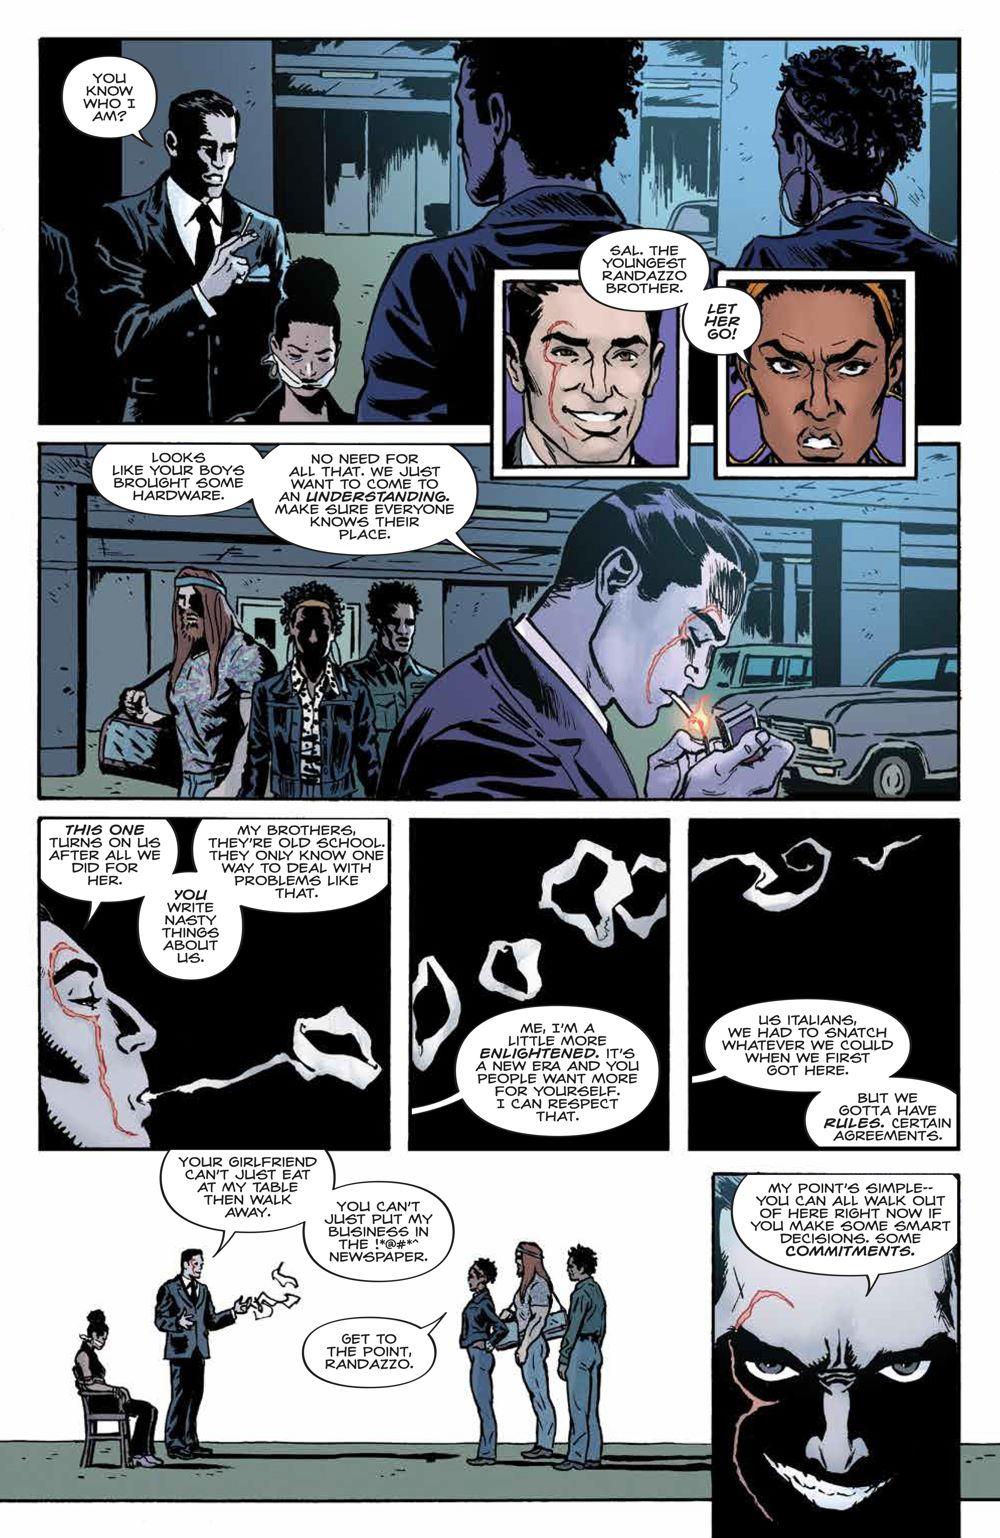 Abbott_1973_004_PRESS_7 ComicList Previews: ABBOTT 1973 #4 (OF 5)